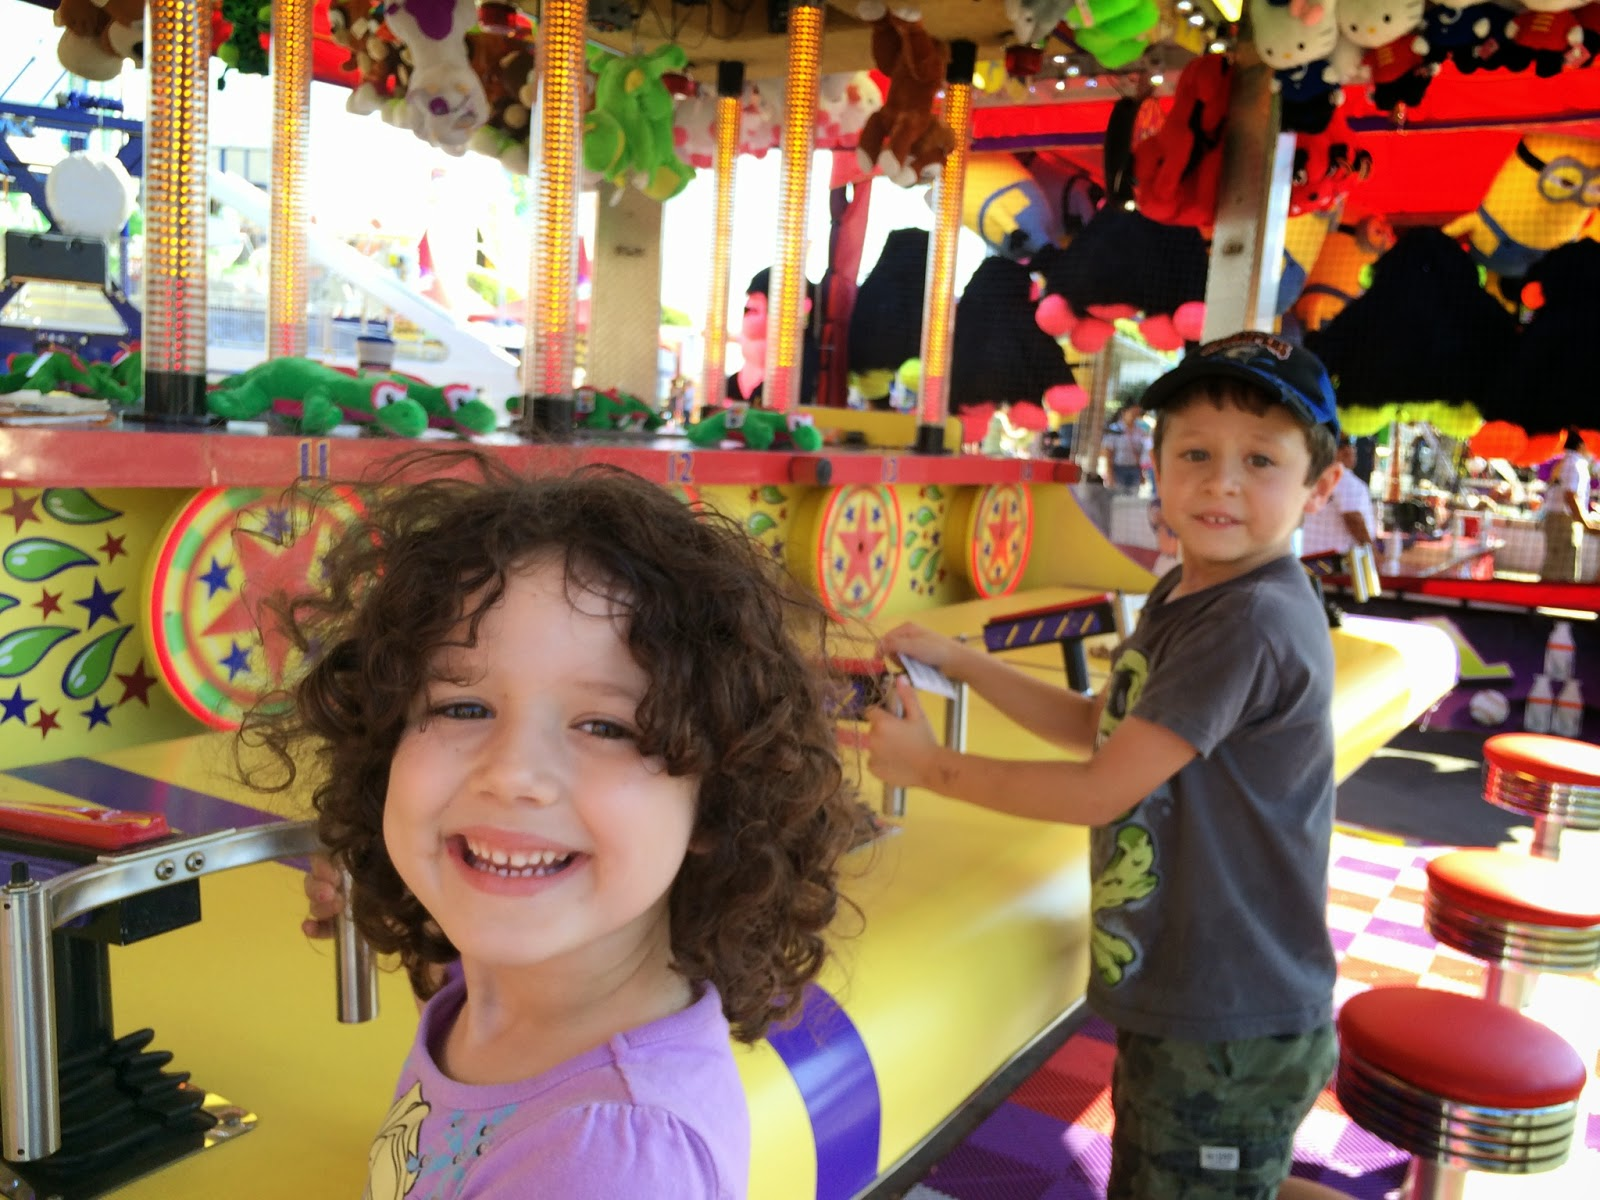 OC Fair, Costa Mesa, carnival, games, kids